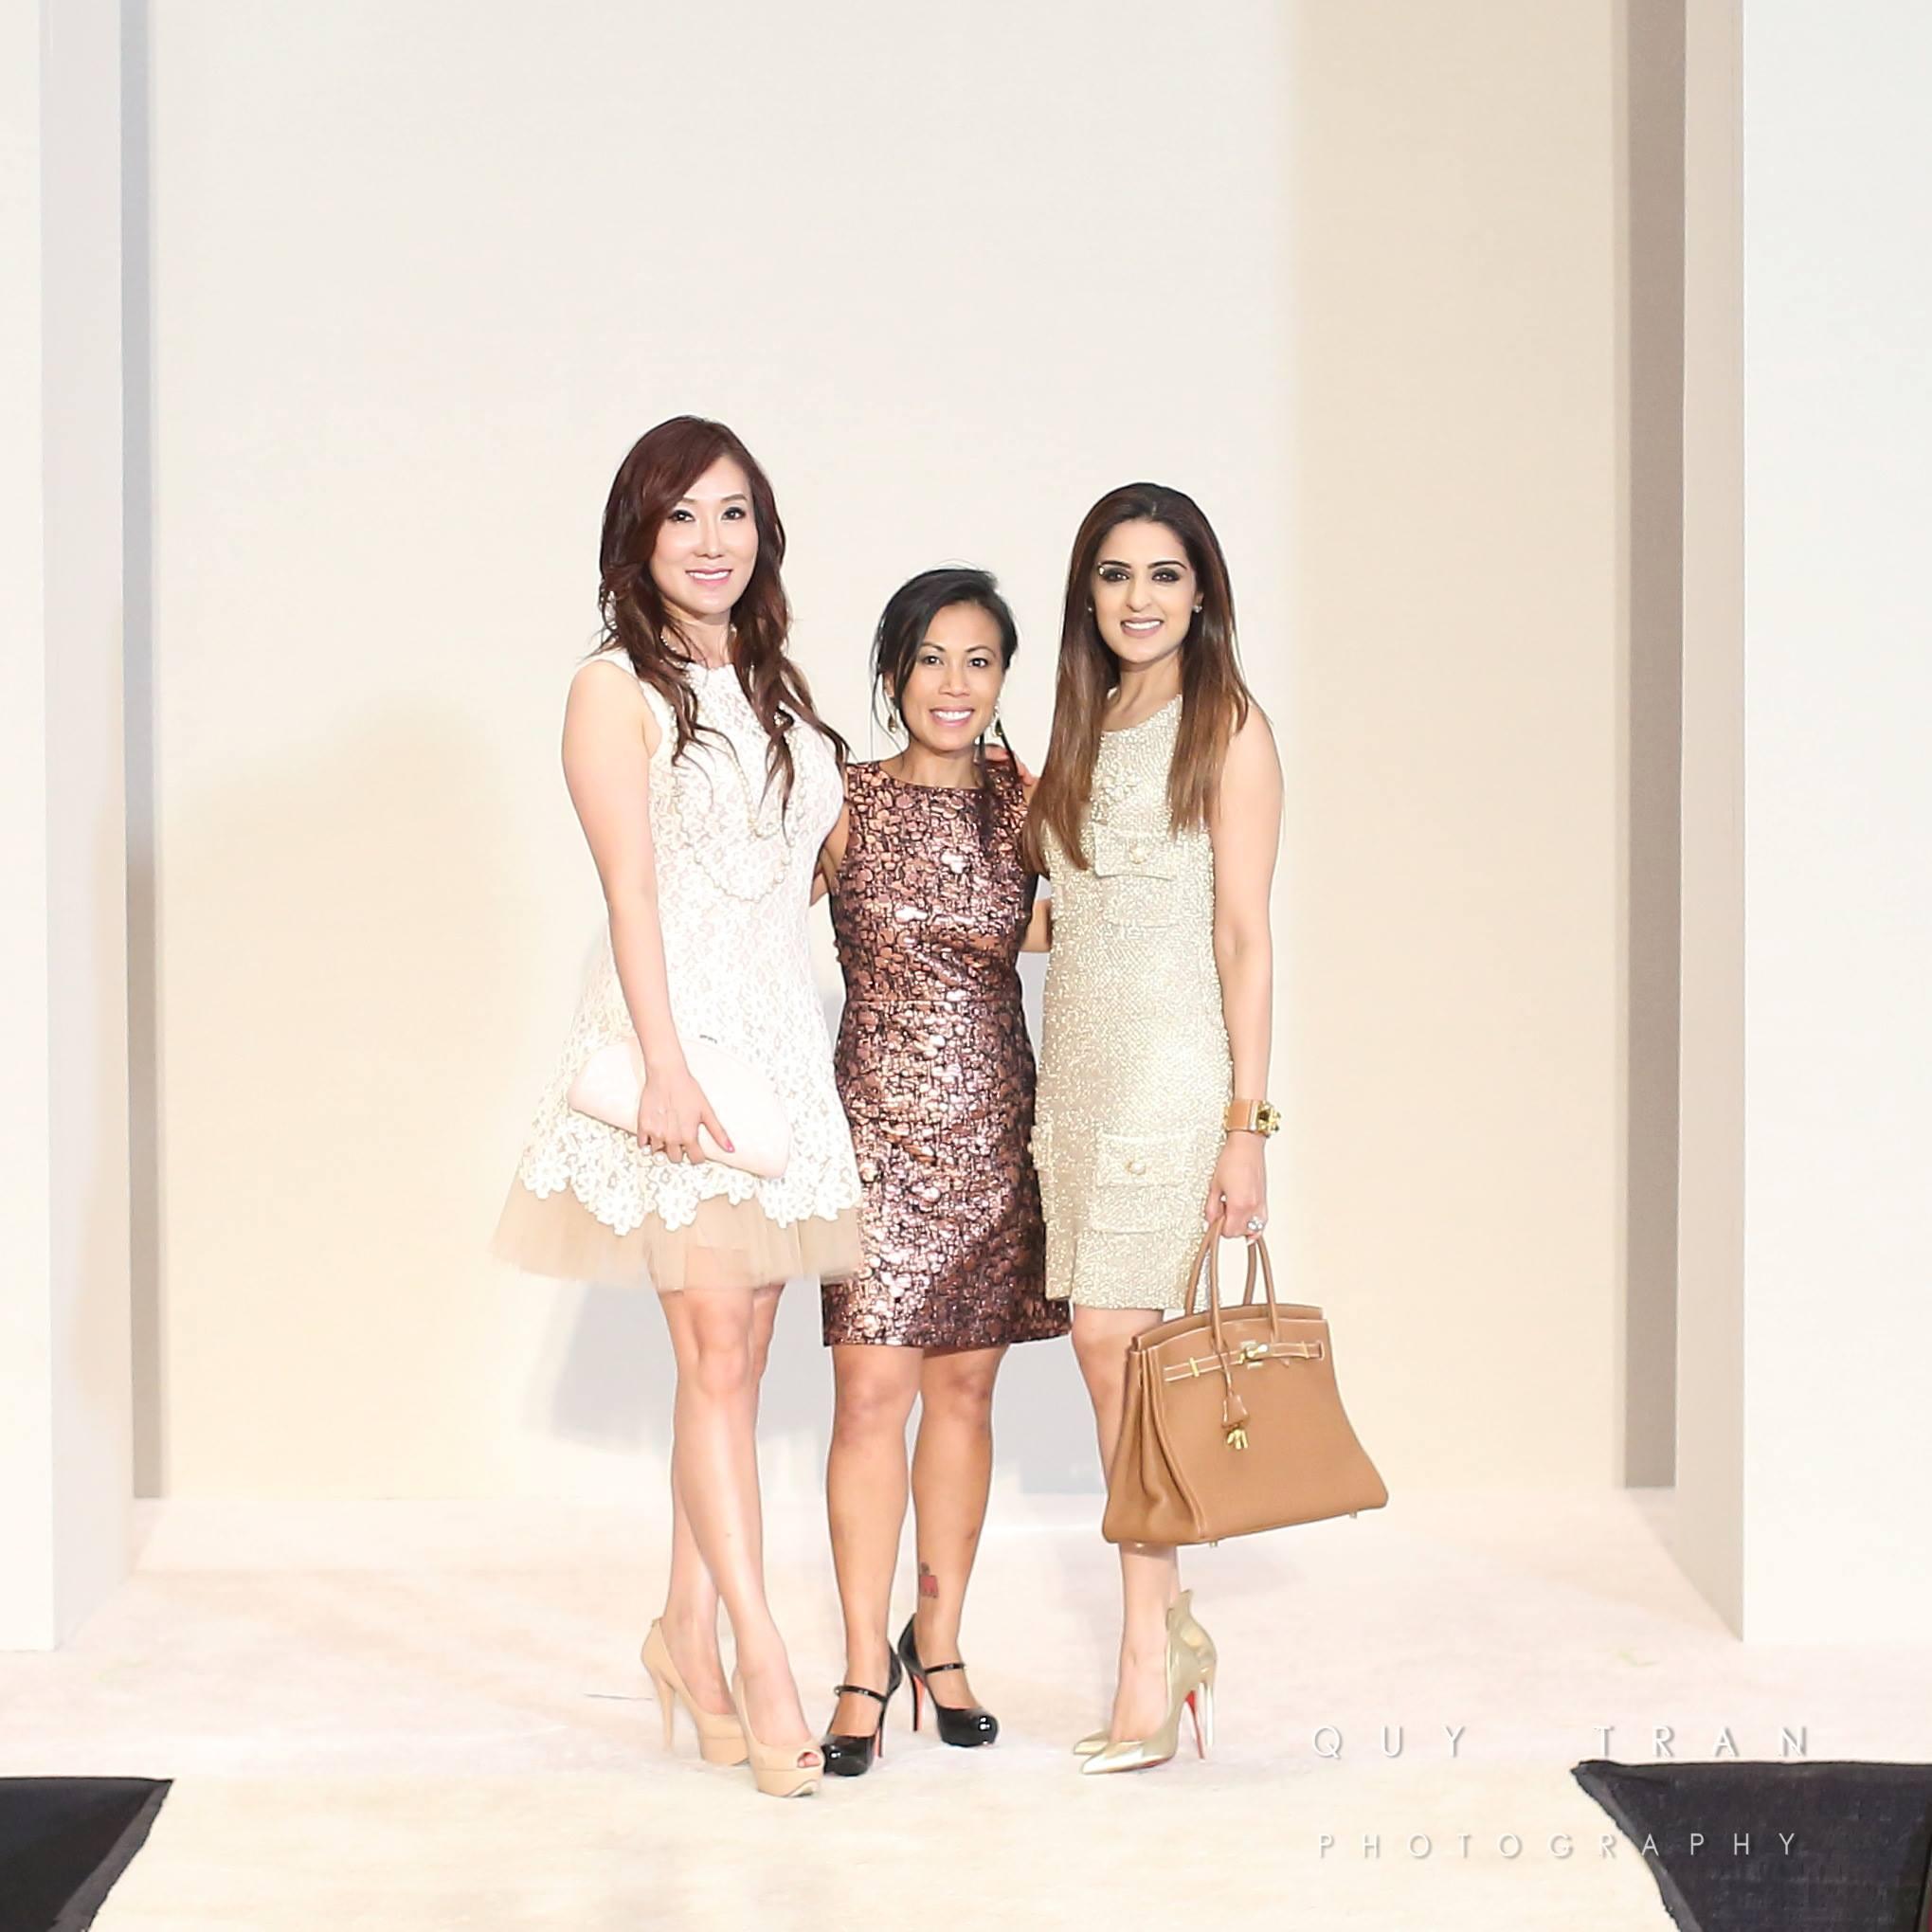 Mandy Kao, Chau Nguyen, Sneha Merchant